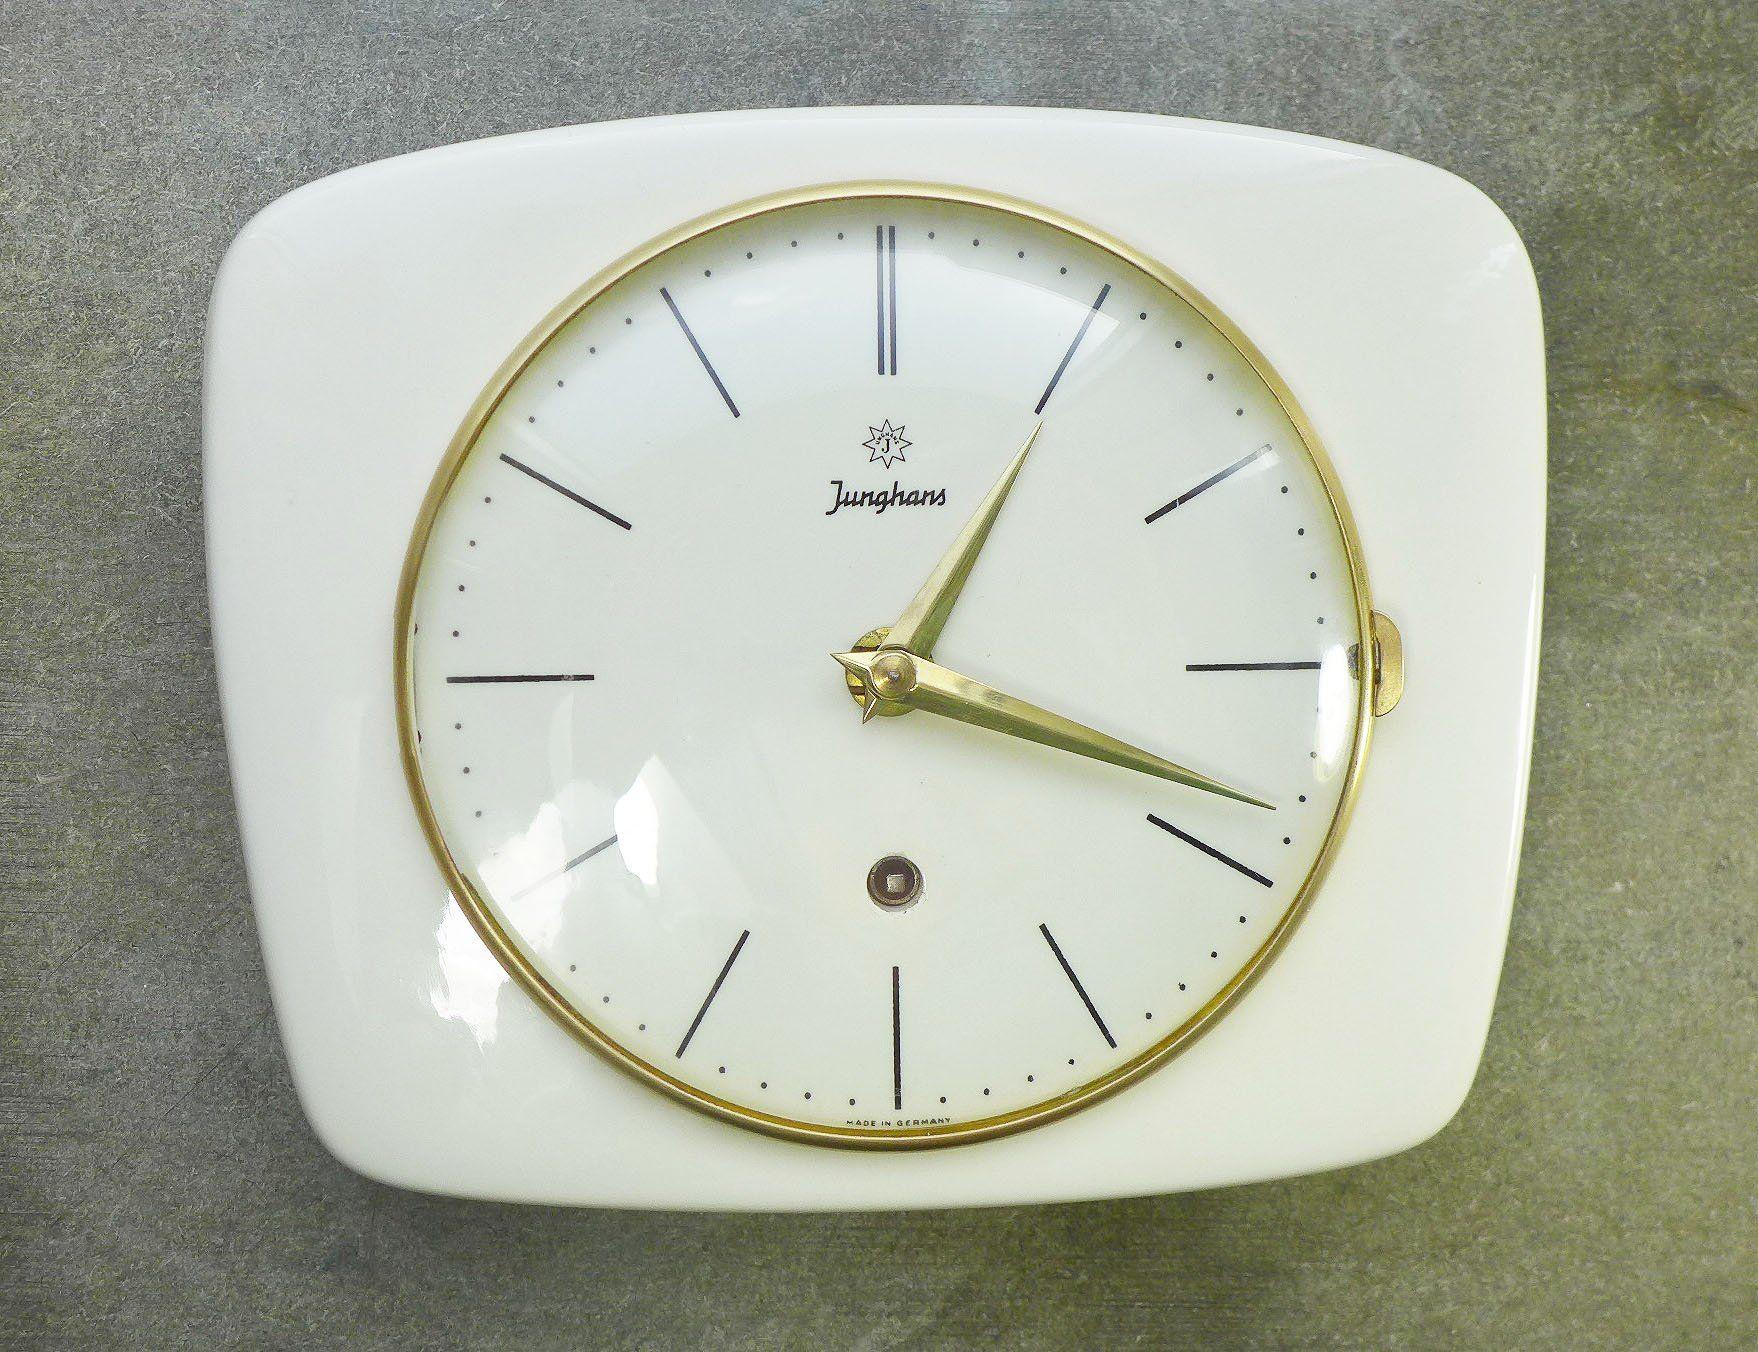 Fantastic Kitchen Clock Wall Clock Made In Germany Ceramic Download Free Architecture Designs Rallybritishbridgeorg